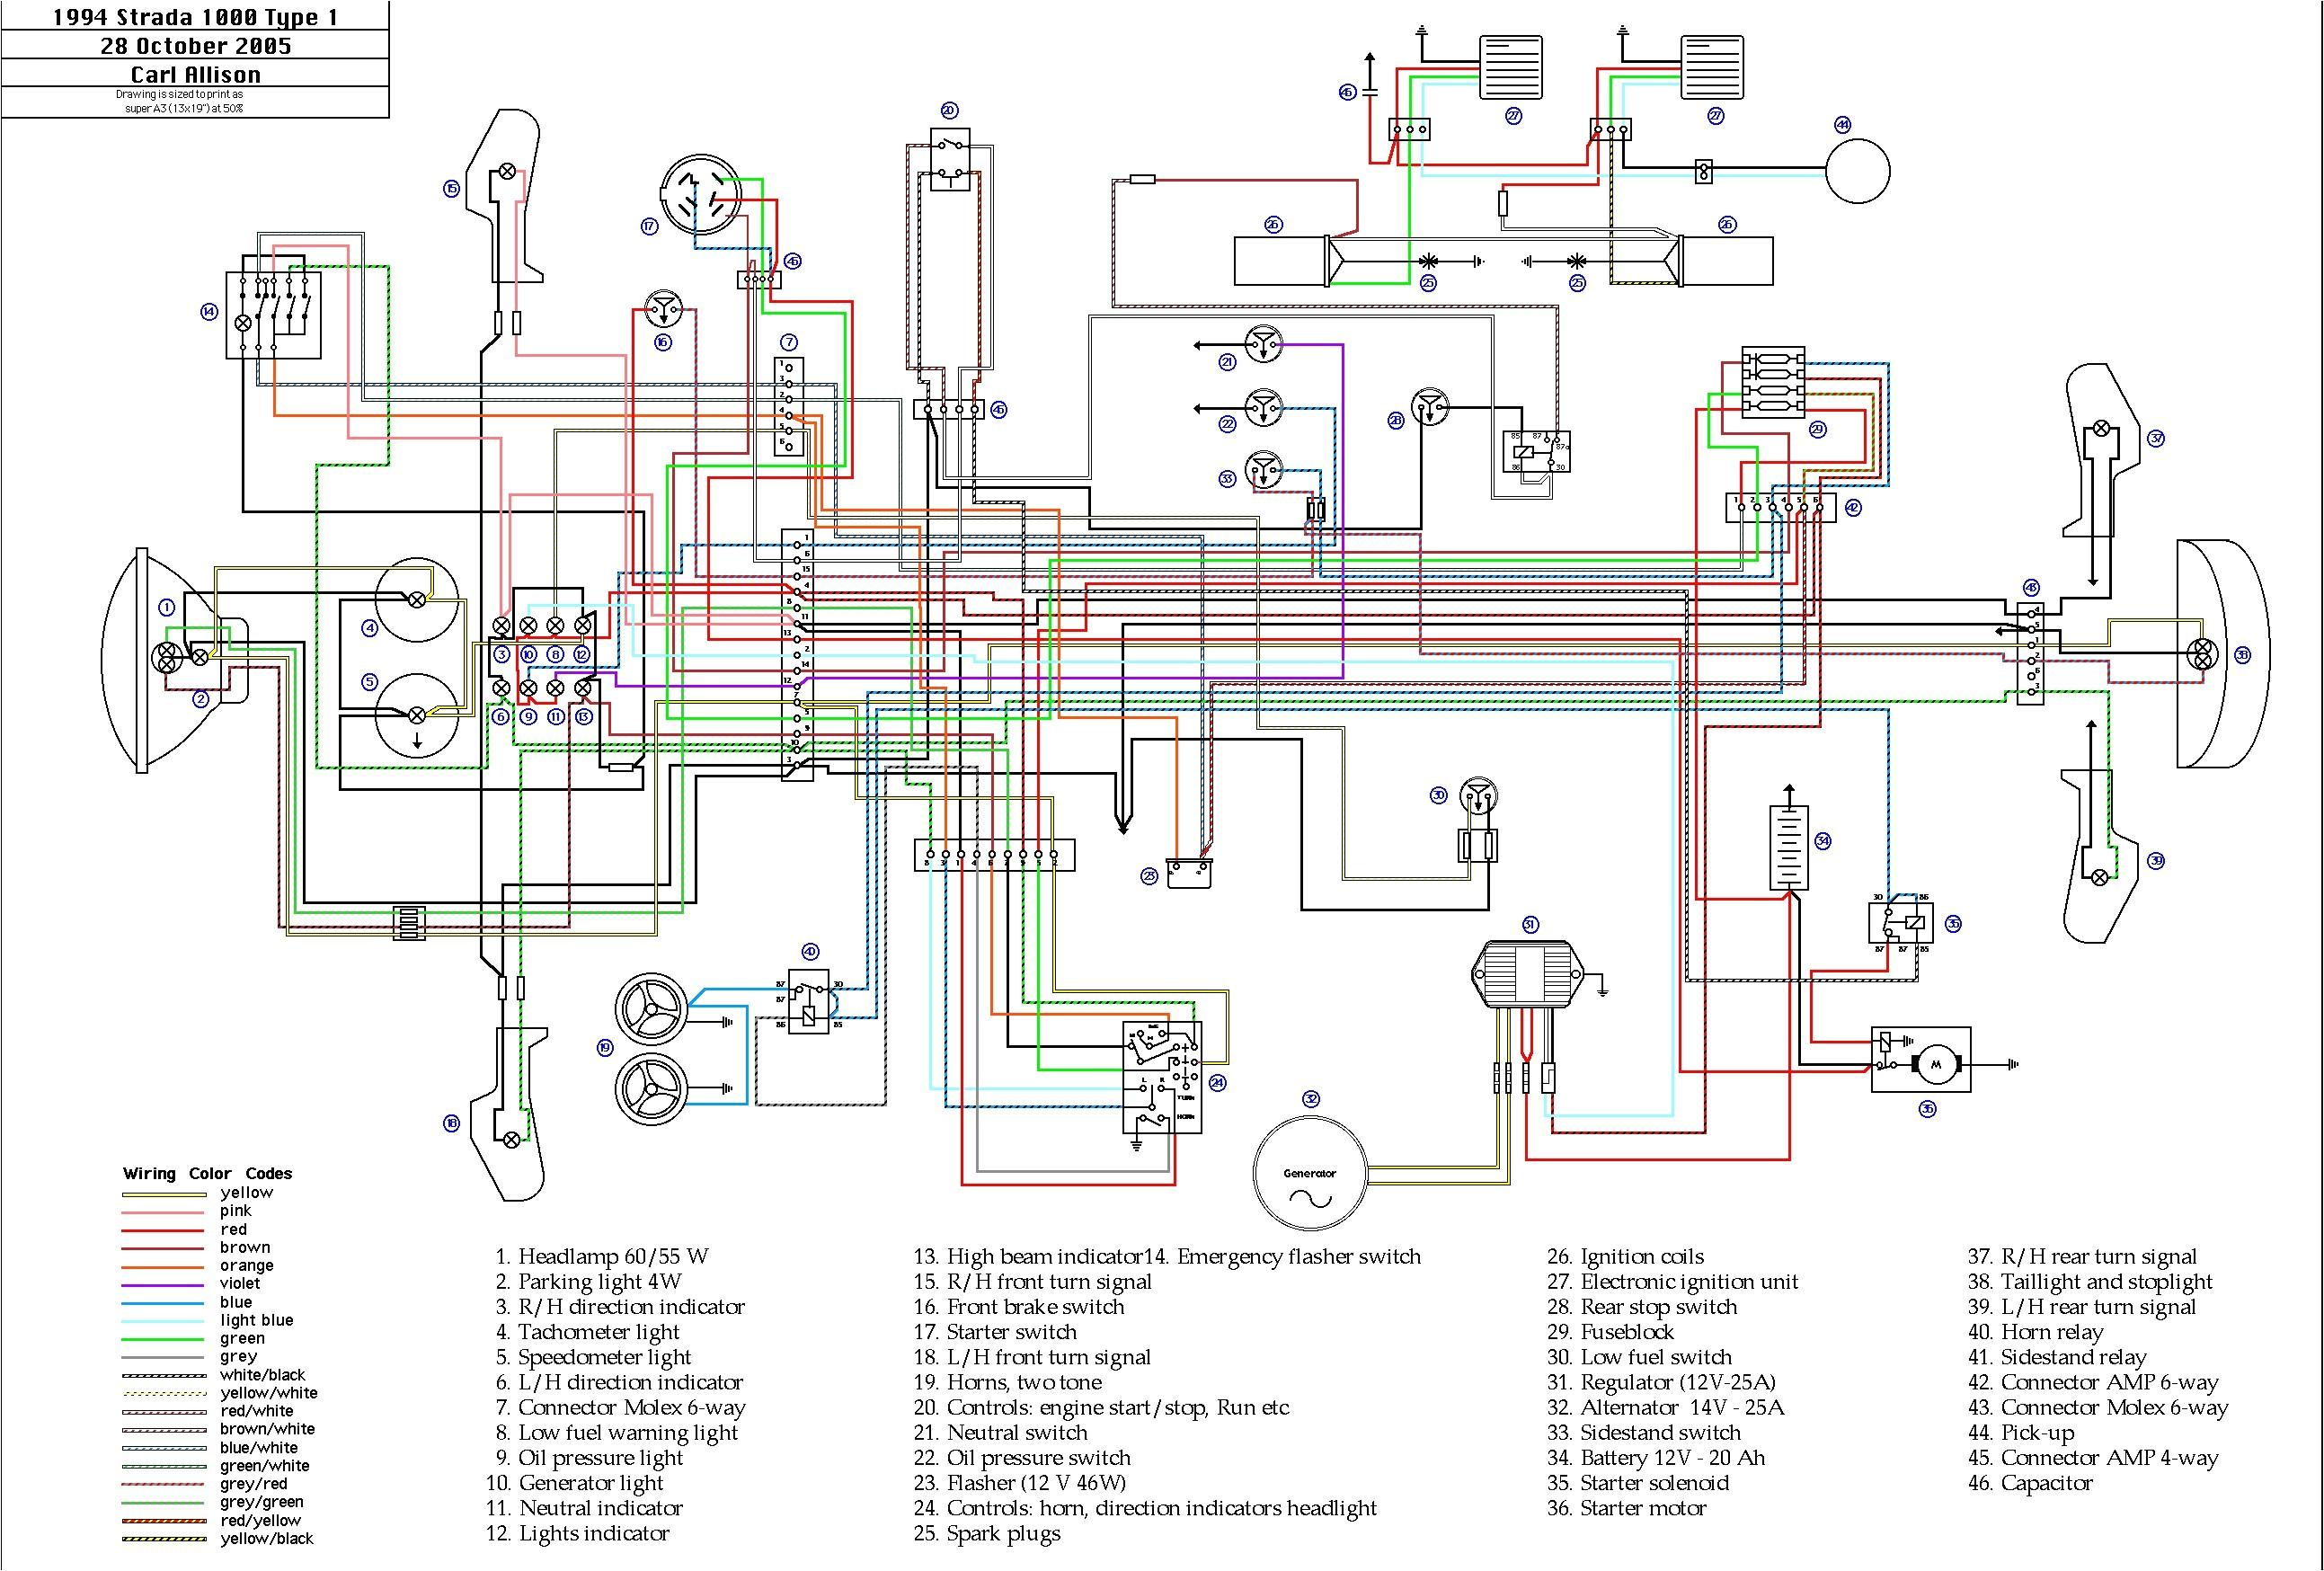 opel radio wiring diagram wiring diagram toolbox vauxhall corsa radio wiring diagram opel astra radio wiring